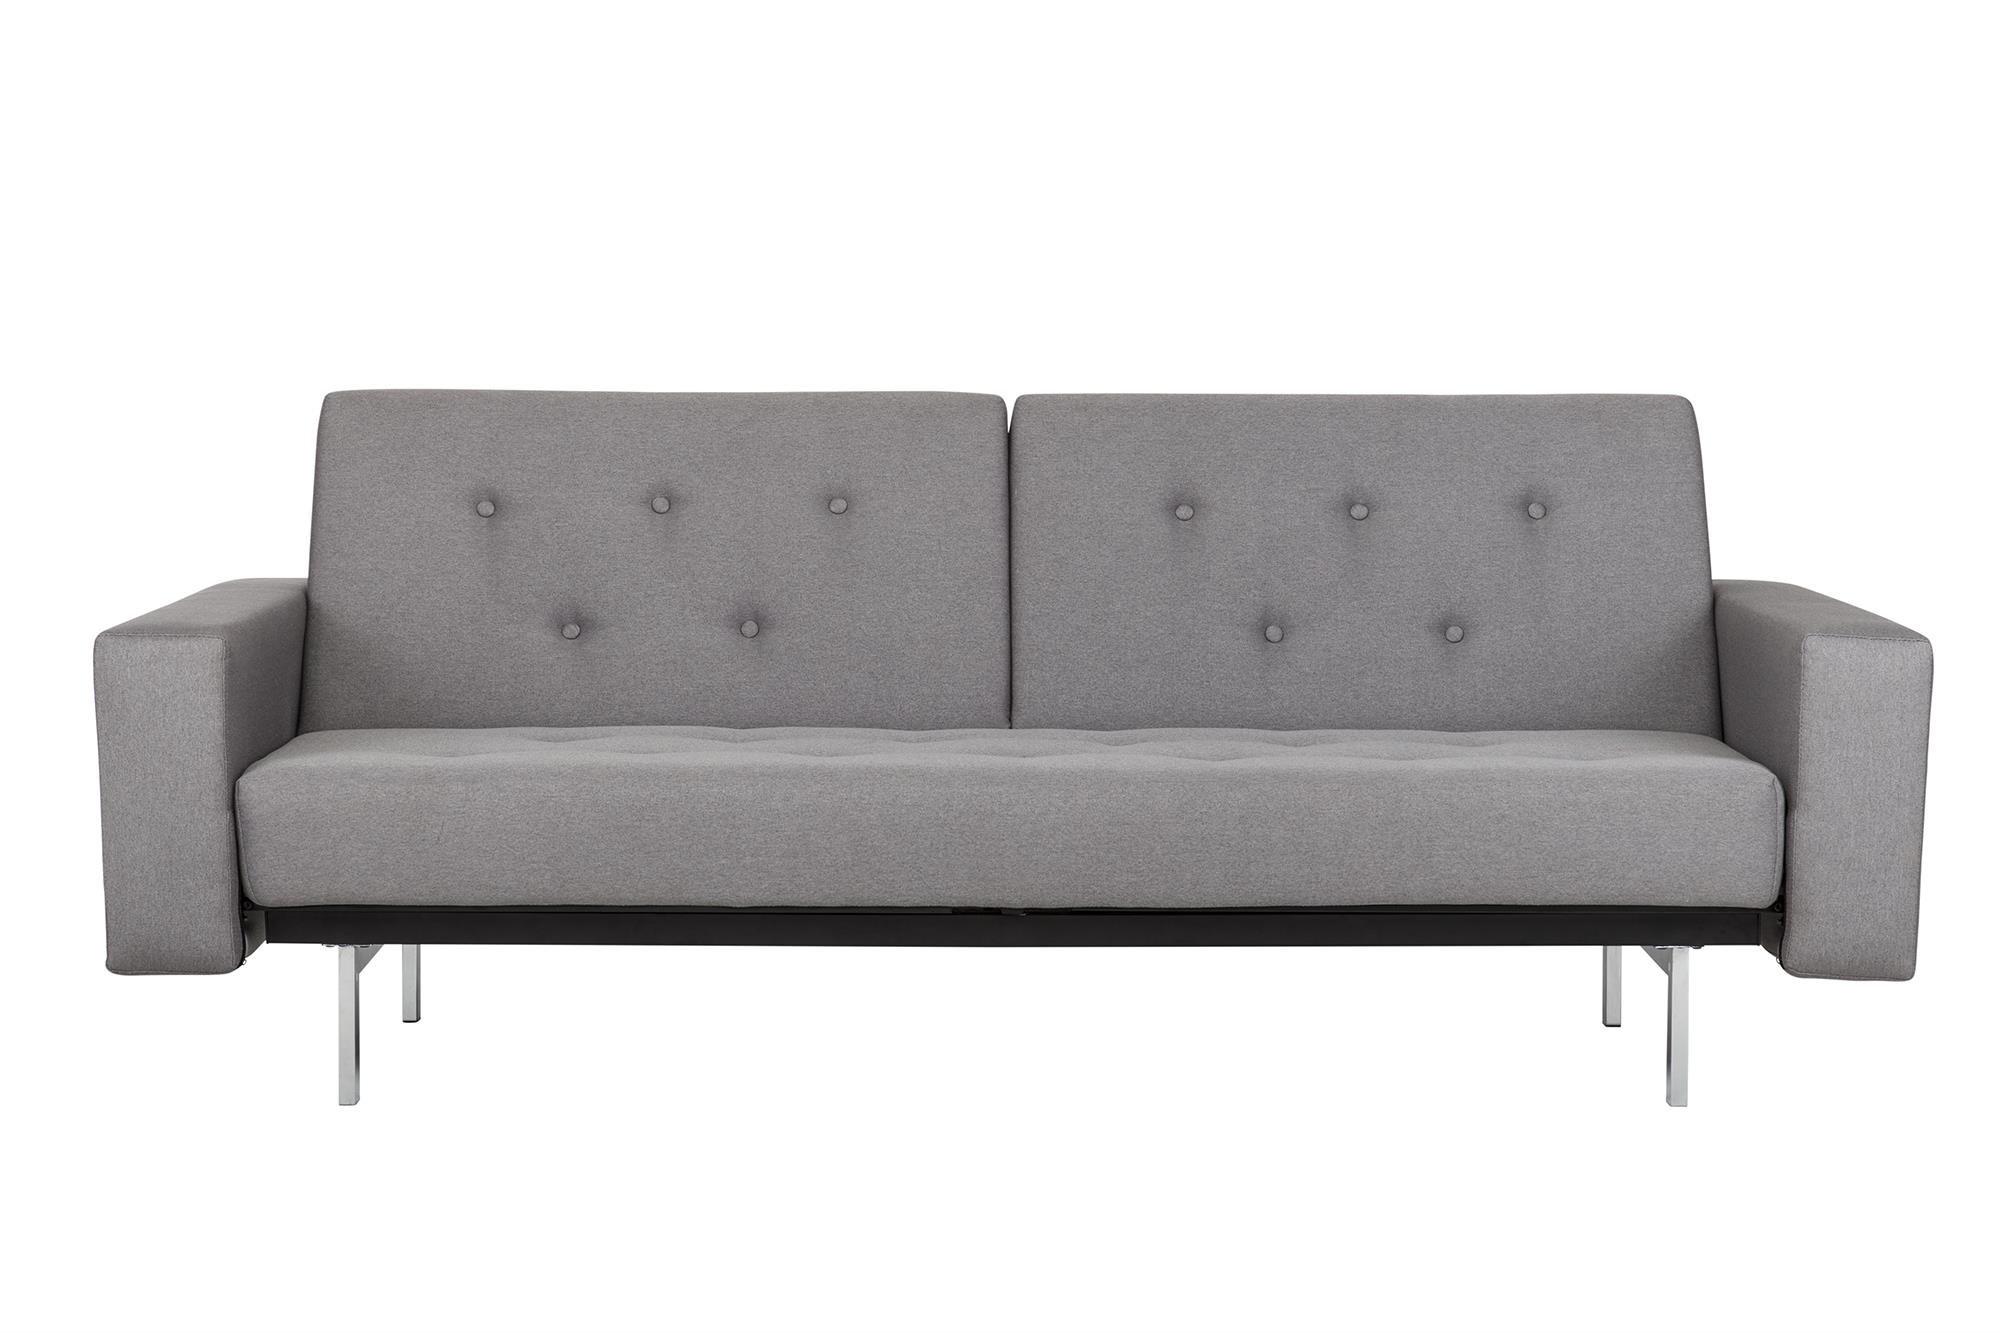 DHP Premium City Linen Queen Futon, Light Grey